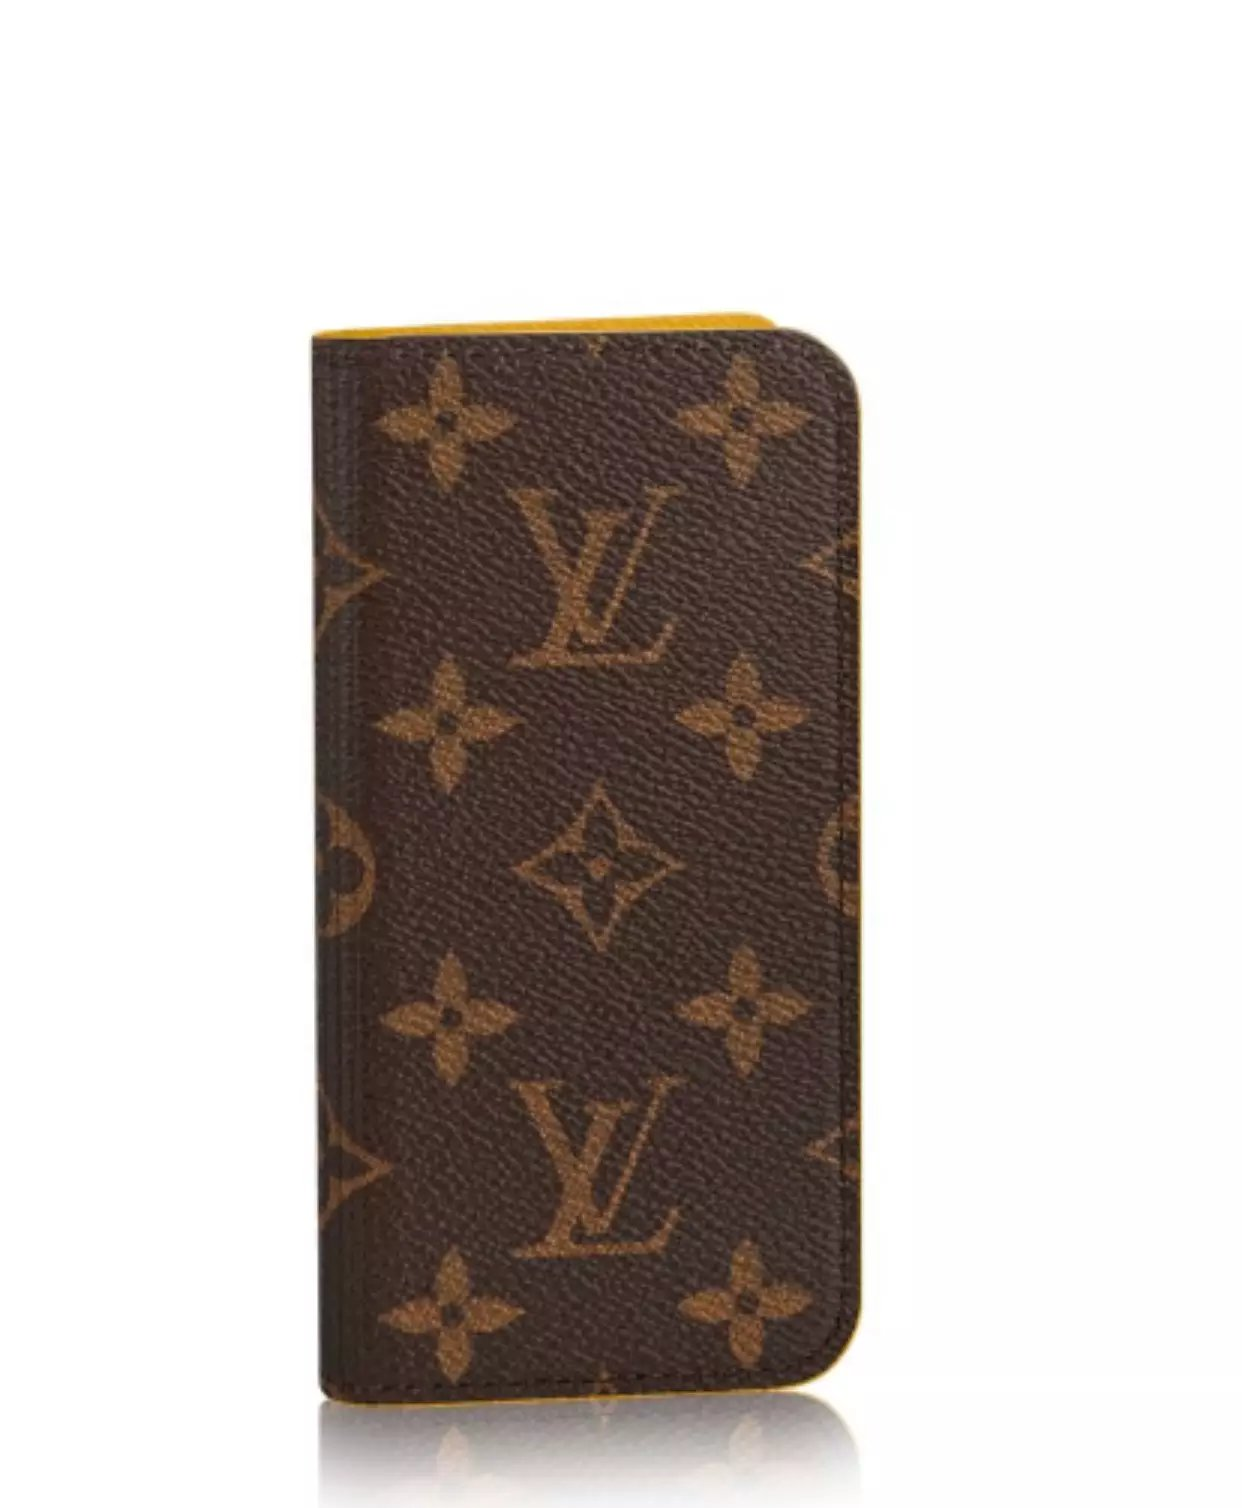 individuelle iphone hülle iphone lederhülle Louis Vuitton iphone6s hülle preis vom iphone 6 iphone 3g hülle hülle für iphone 3 iphone cover mit foto iphone 6s a6s elber machen handycover 6slbst machen